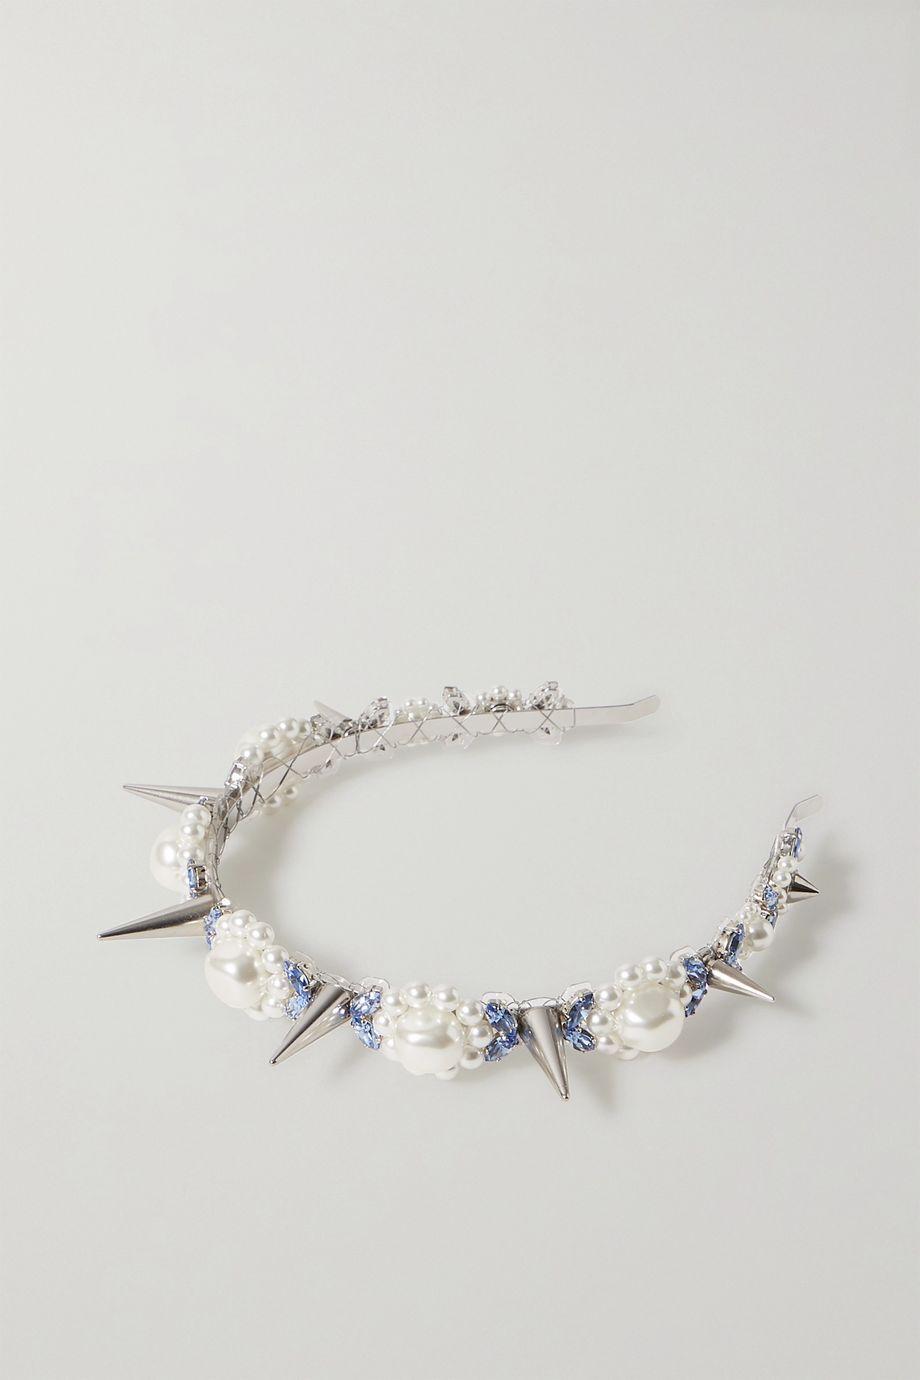 Simone Rocha Silver-tone, faux pearl and crystal headband